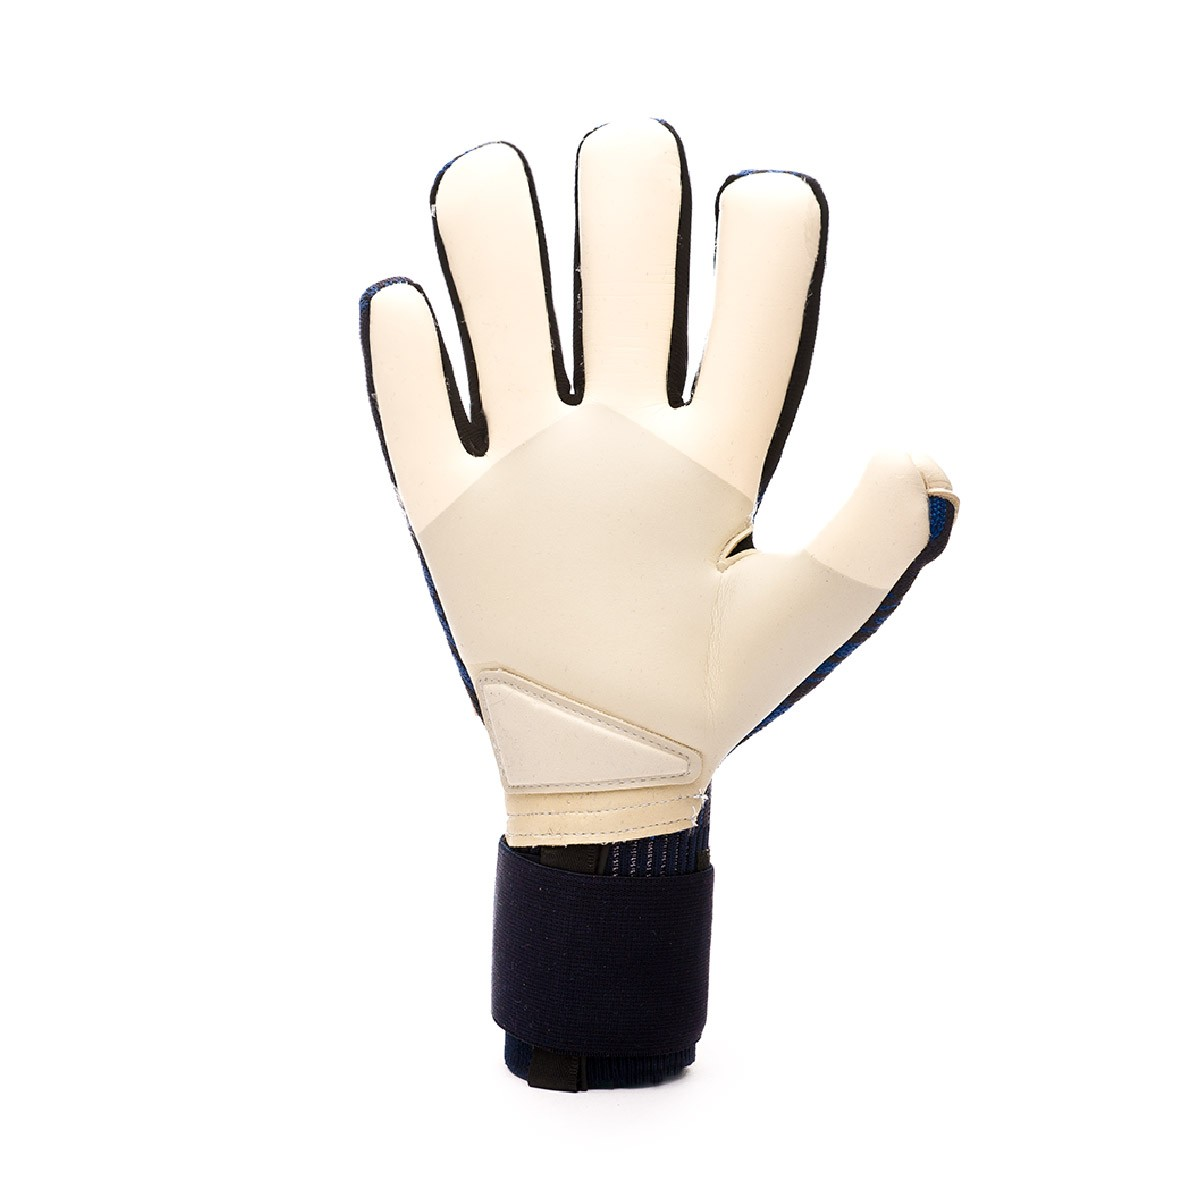 Glove adidas Predator Pro Cold Mode